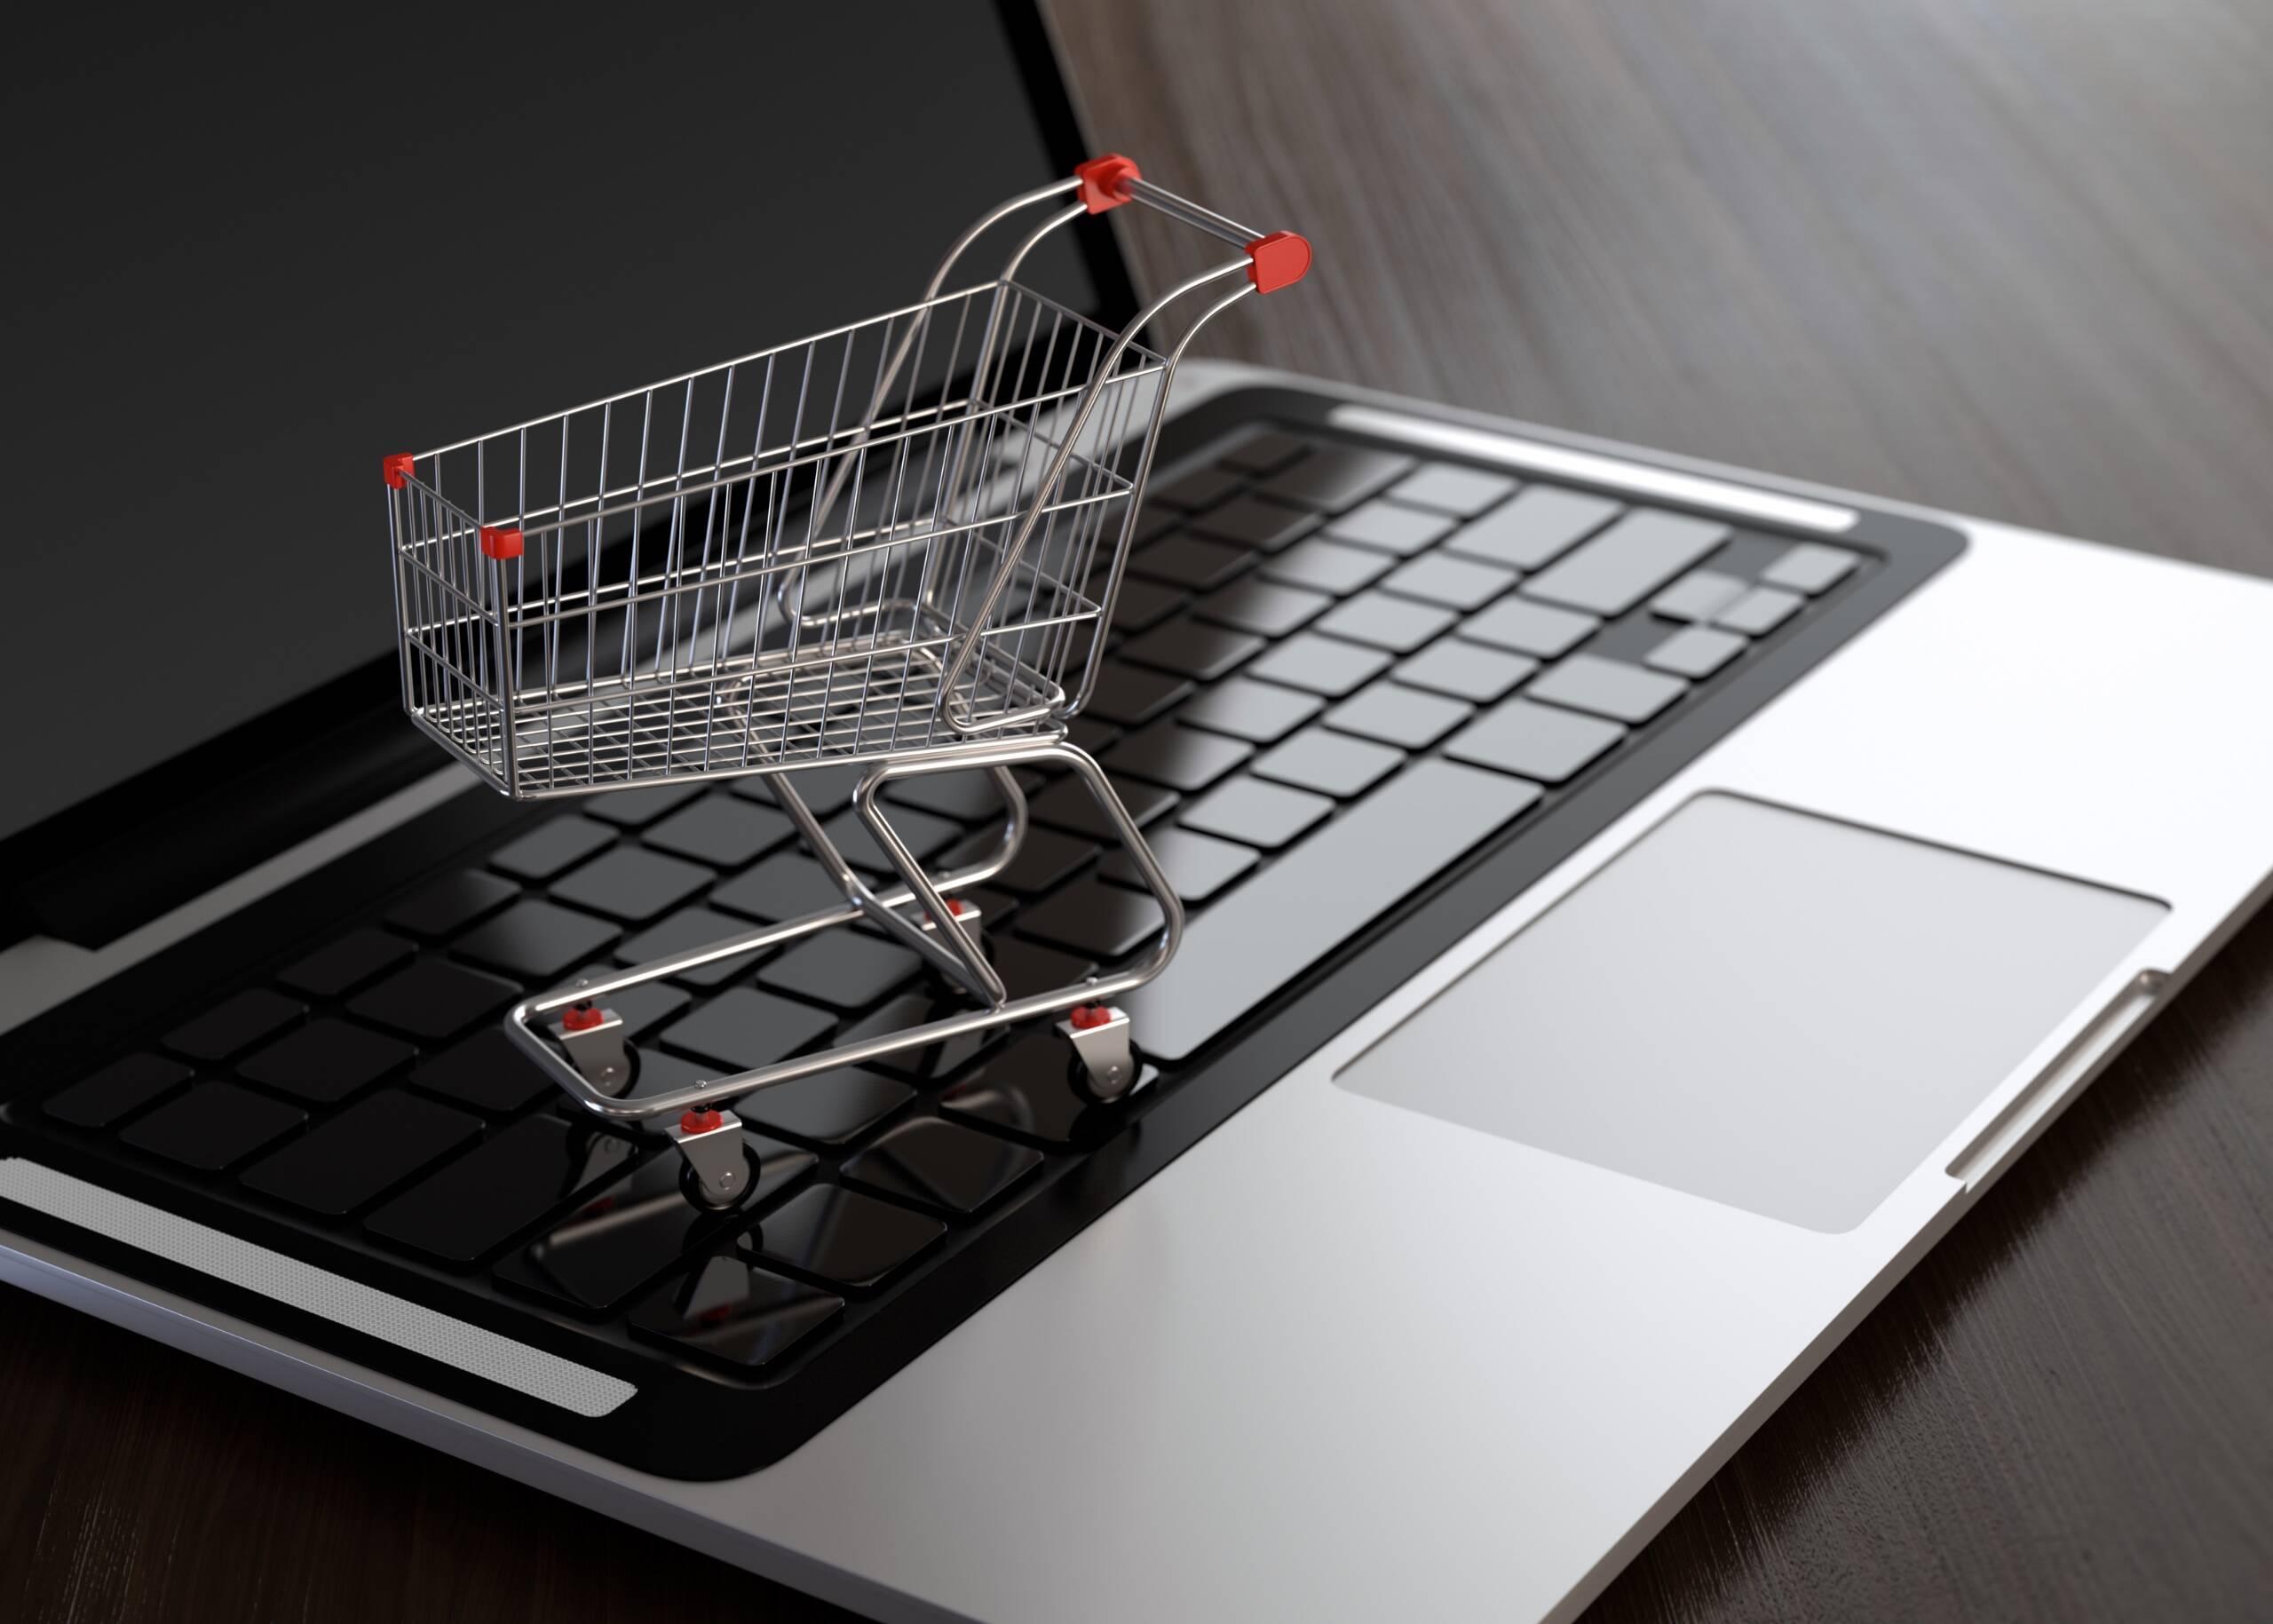 Laptop with shopping cart Singapore e-commerce platform